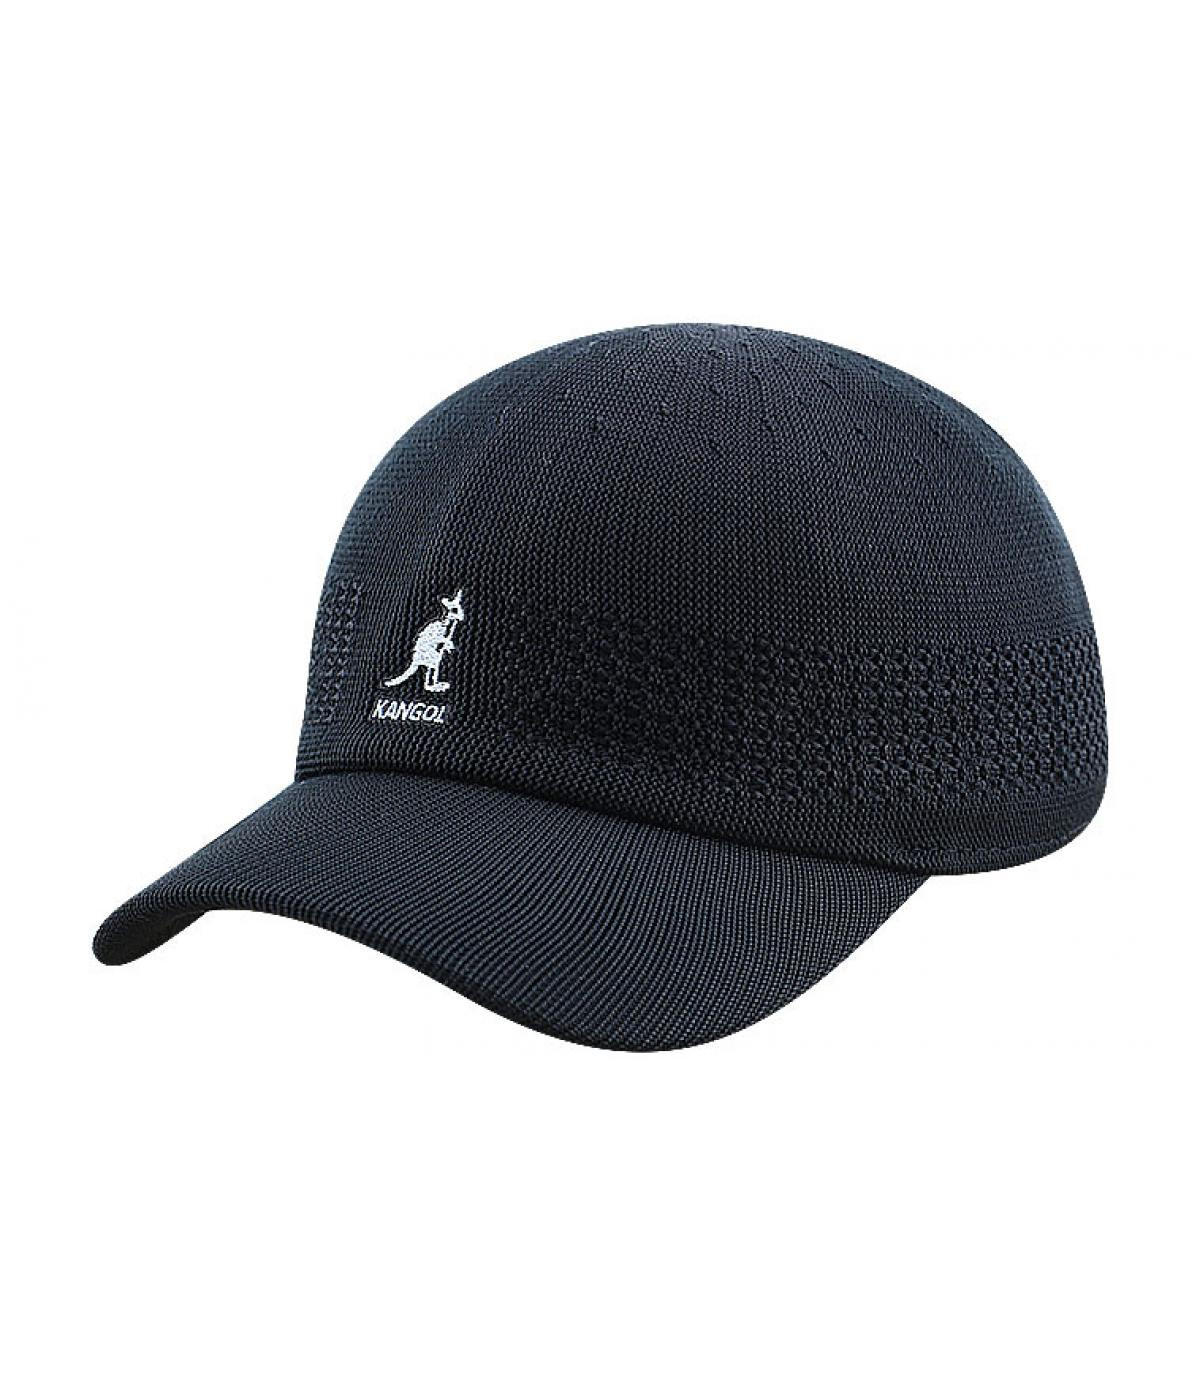 kangol schwarze Trucker Cap